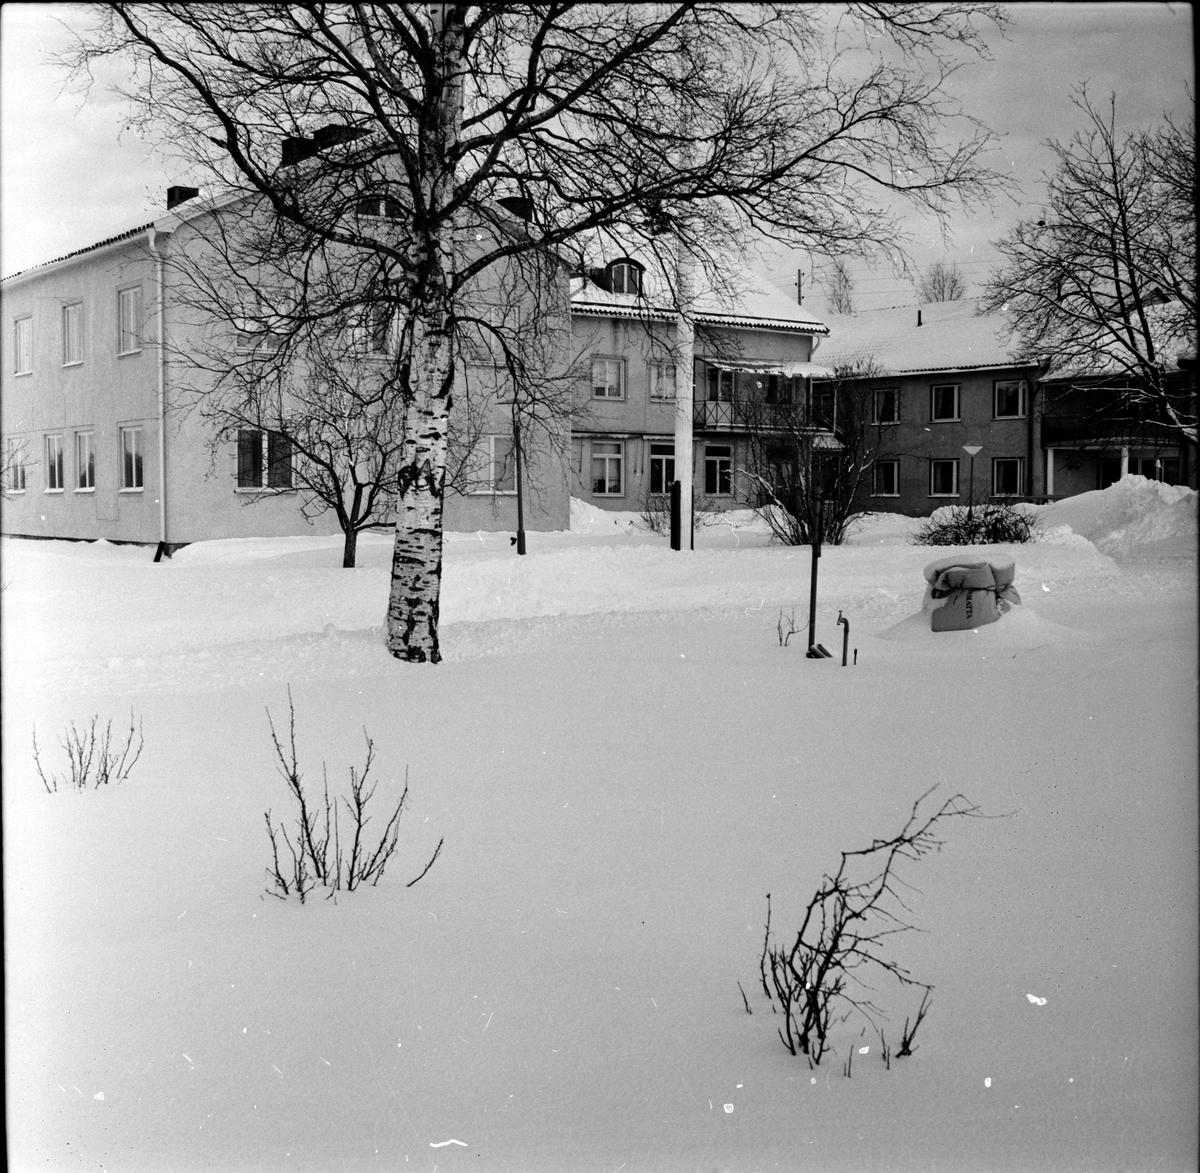 Arbrå, Stenbacka, Fru Annie Roos avtackas, Mars 1970